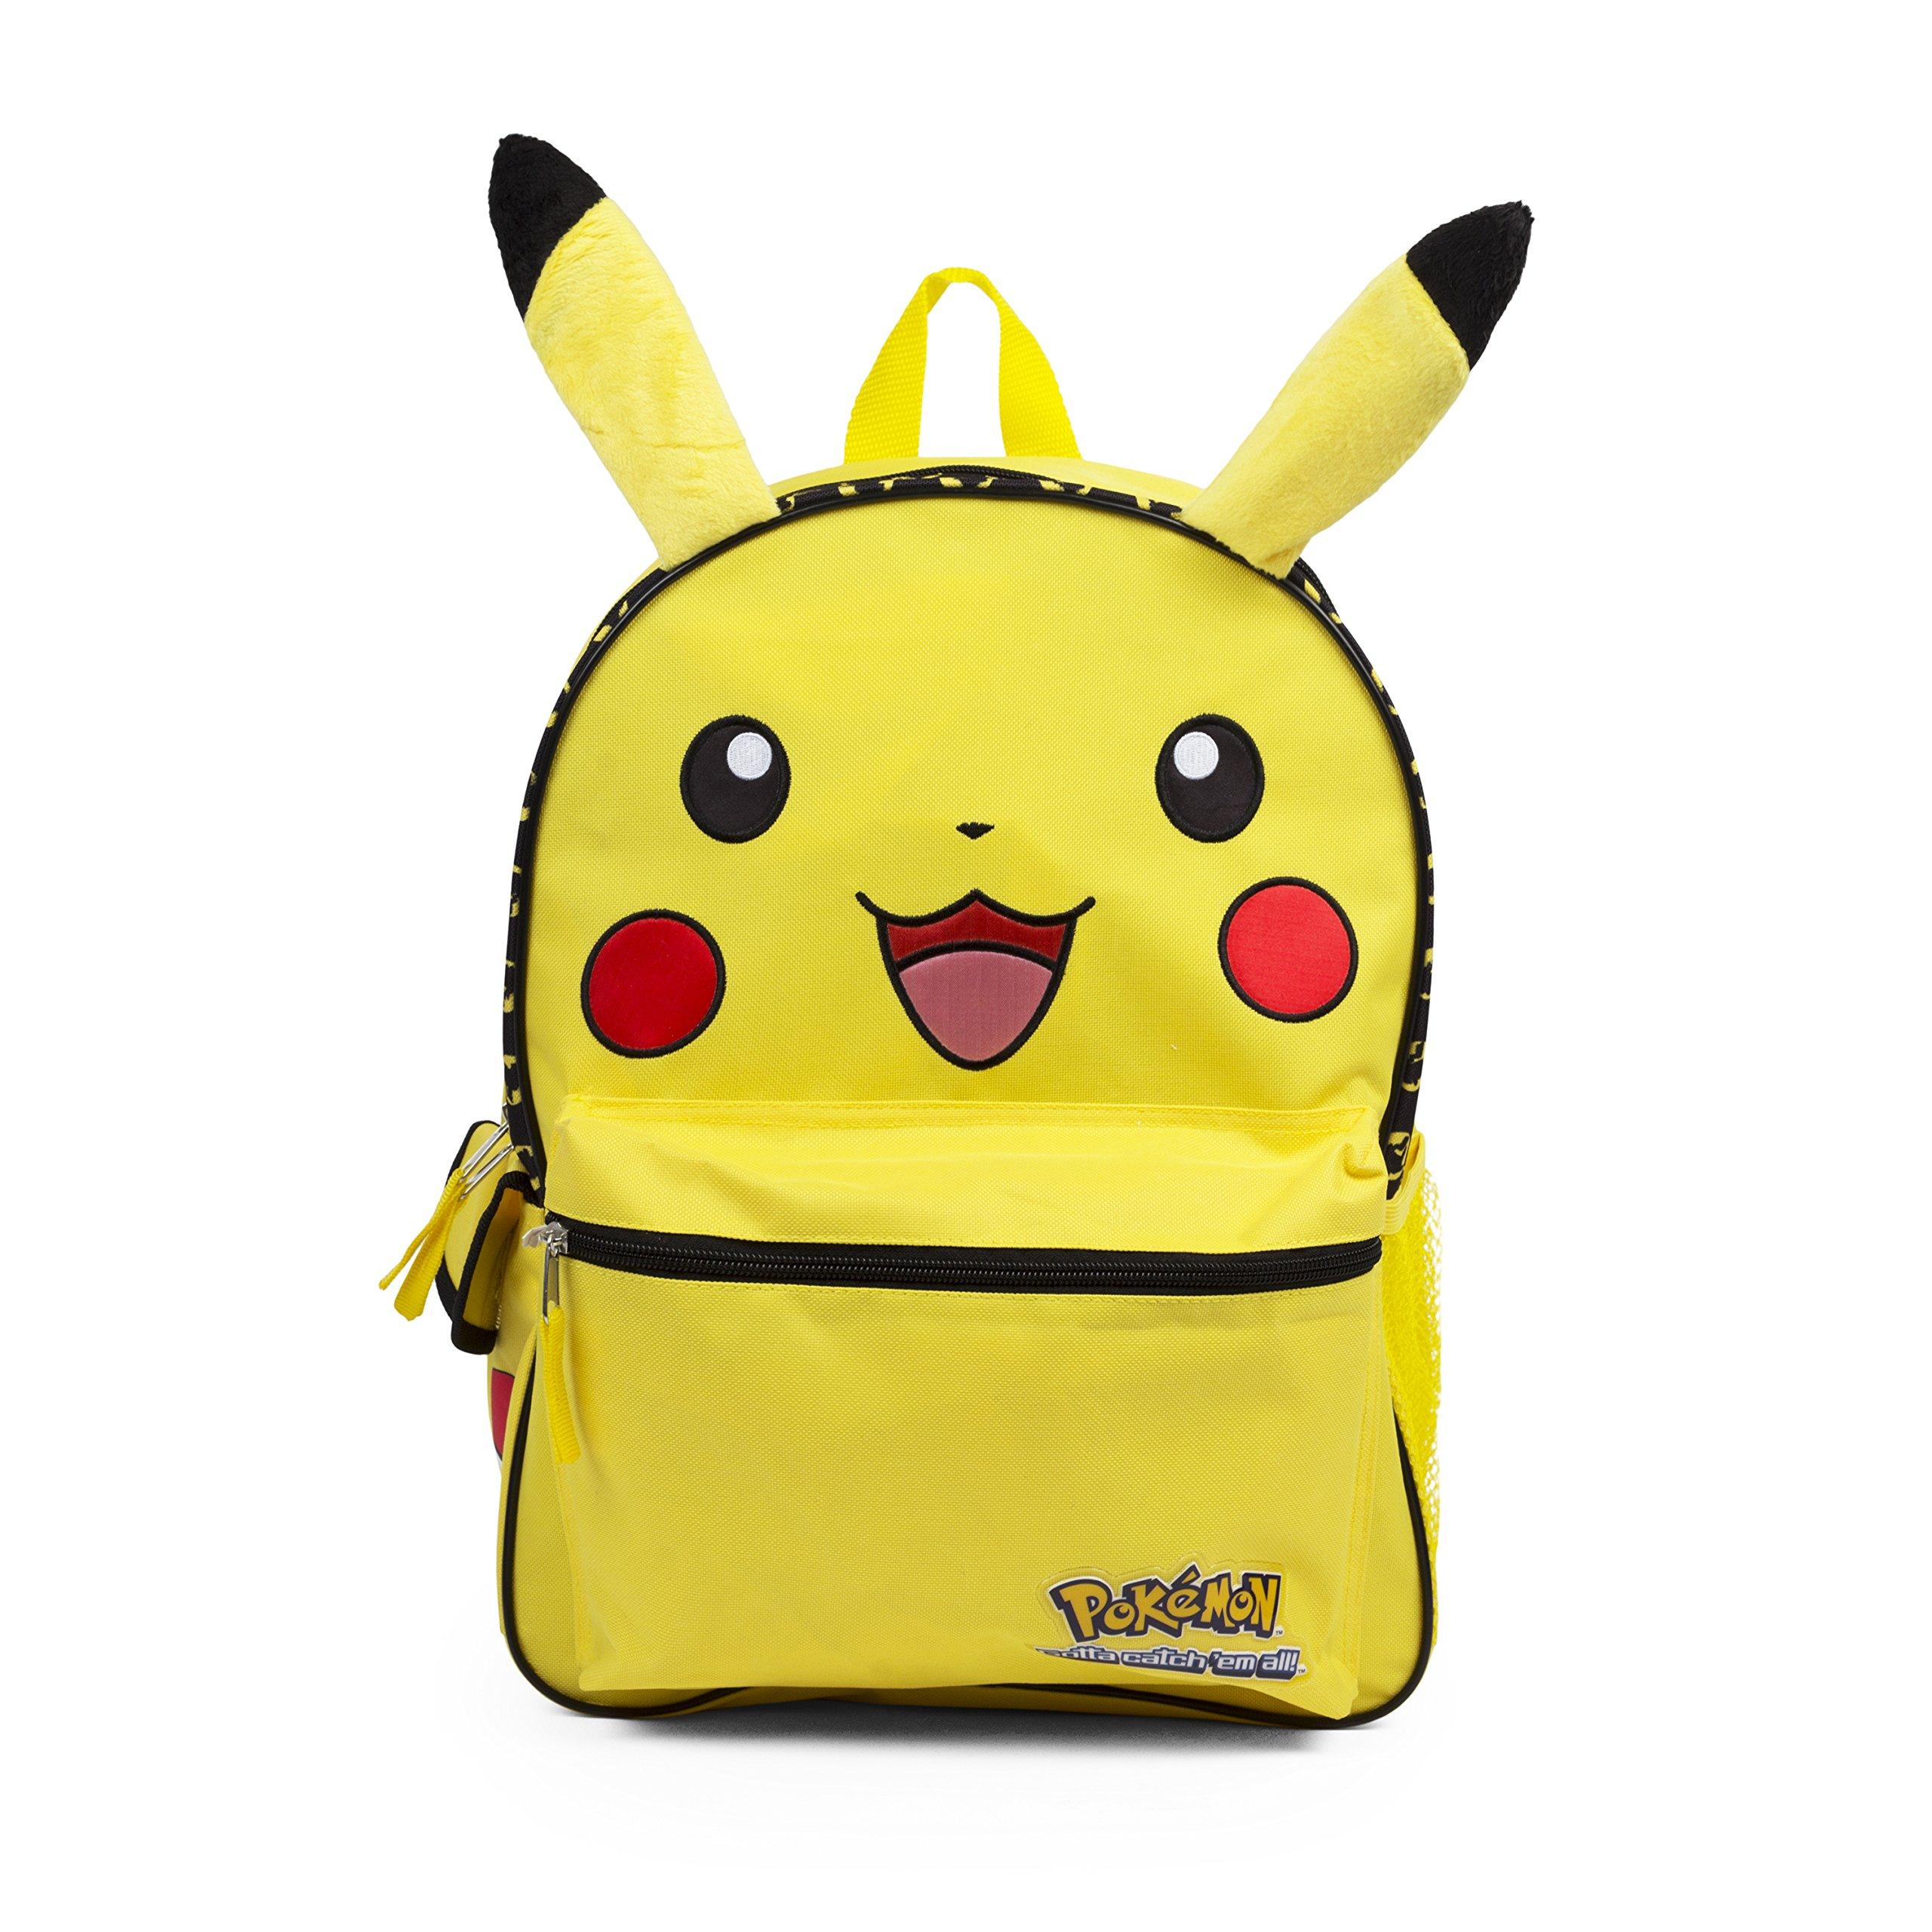 8a6696eb3791 Get Quotations · Pokemon Happy Pikachu 12